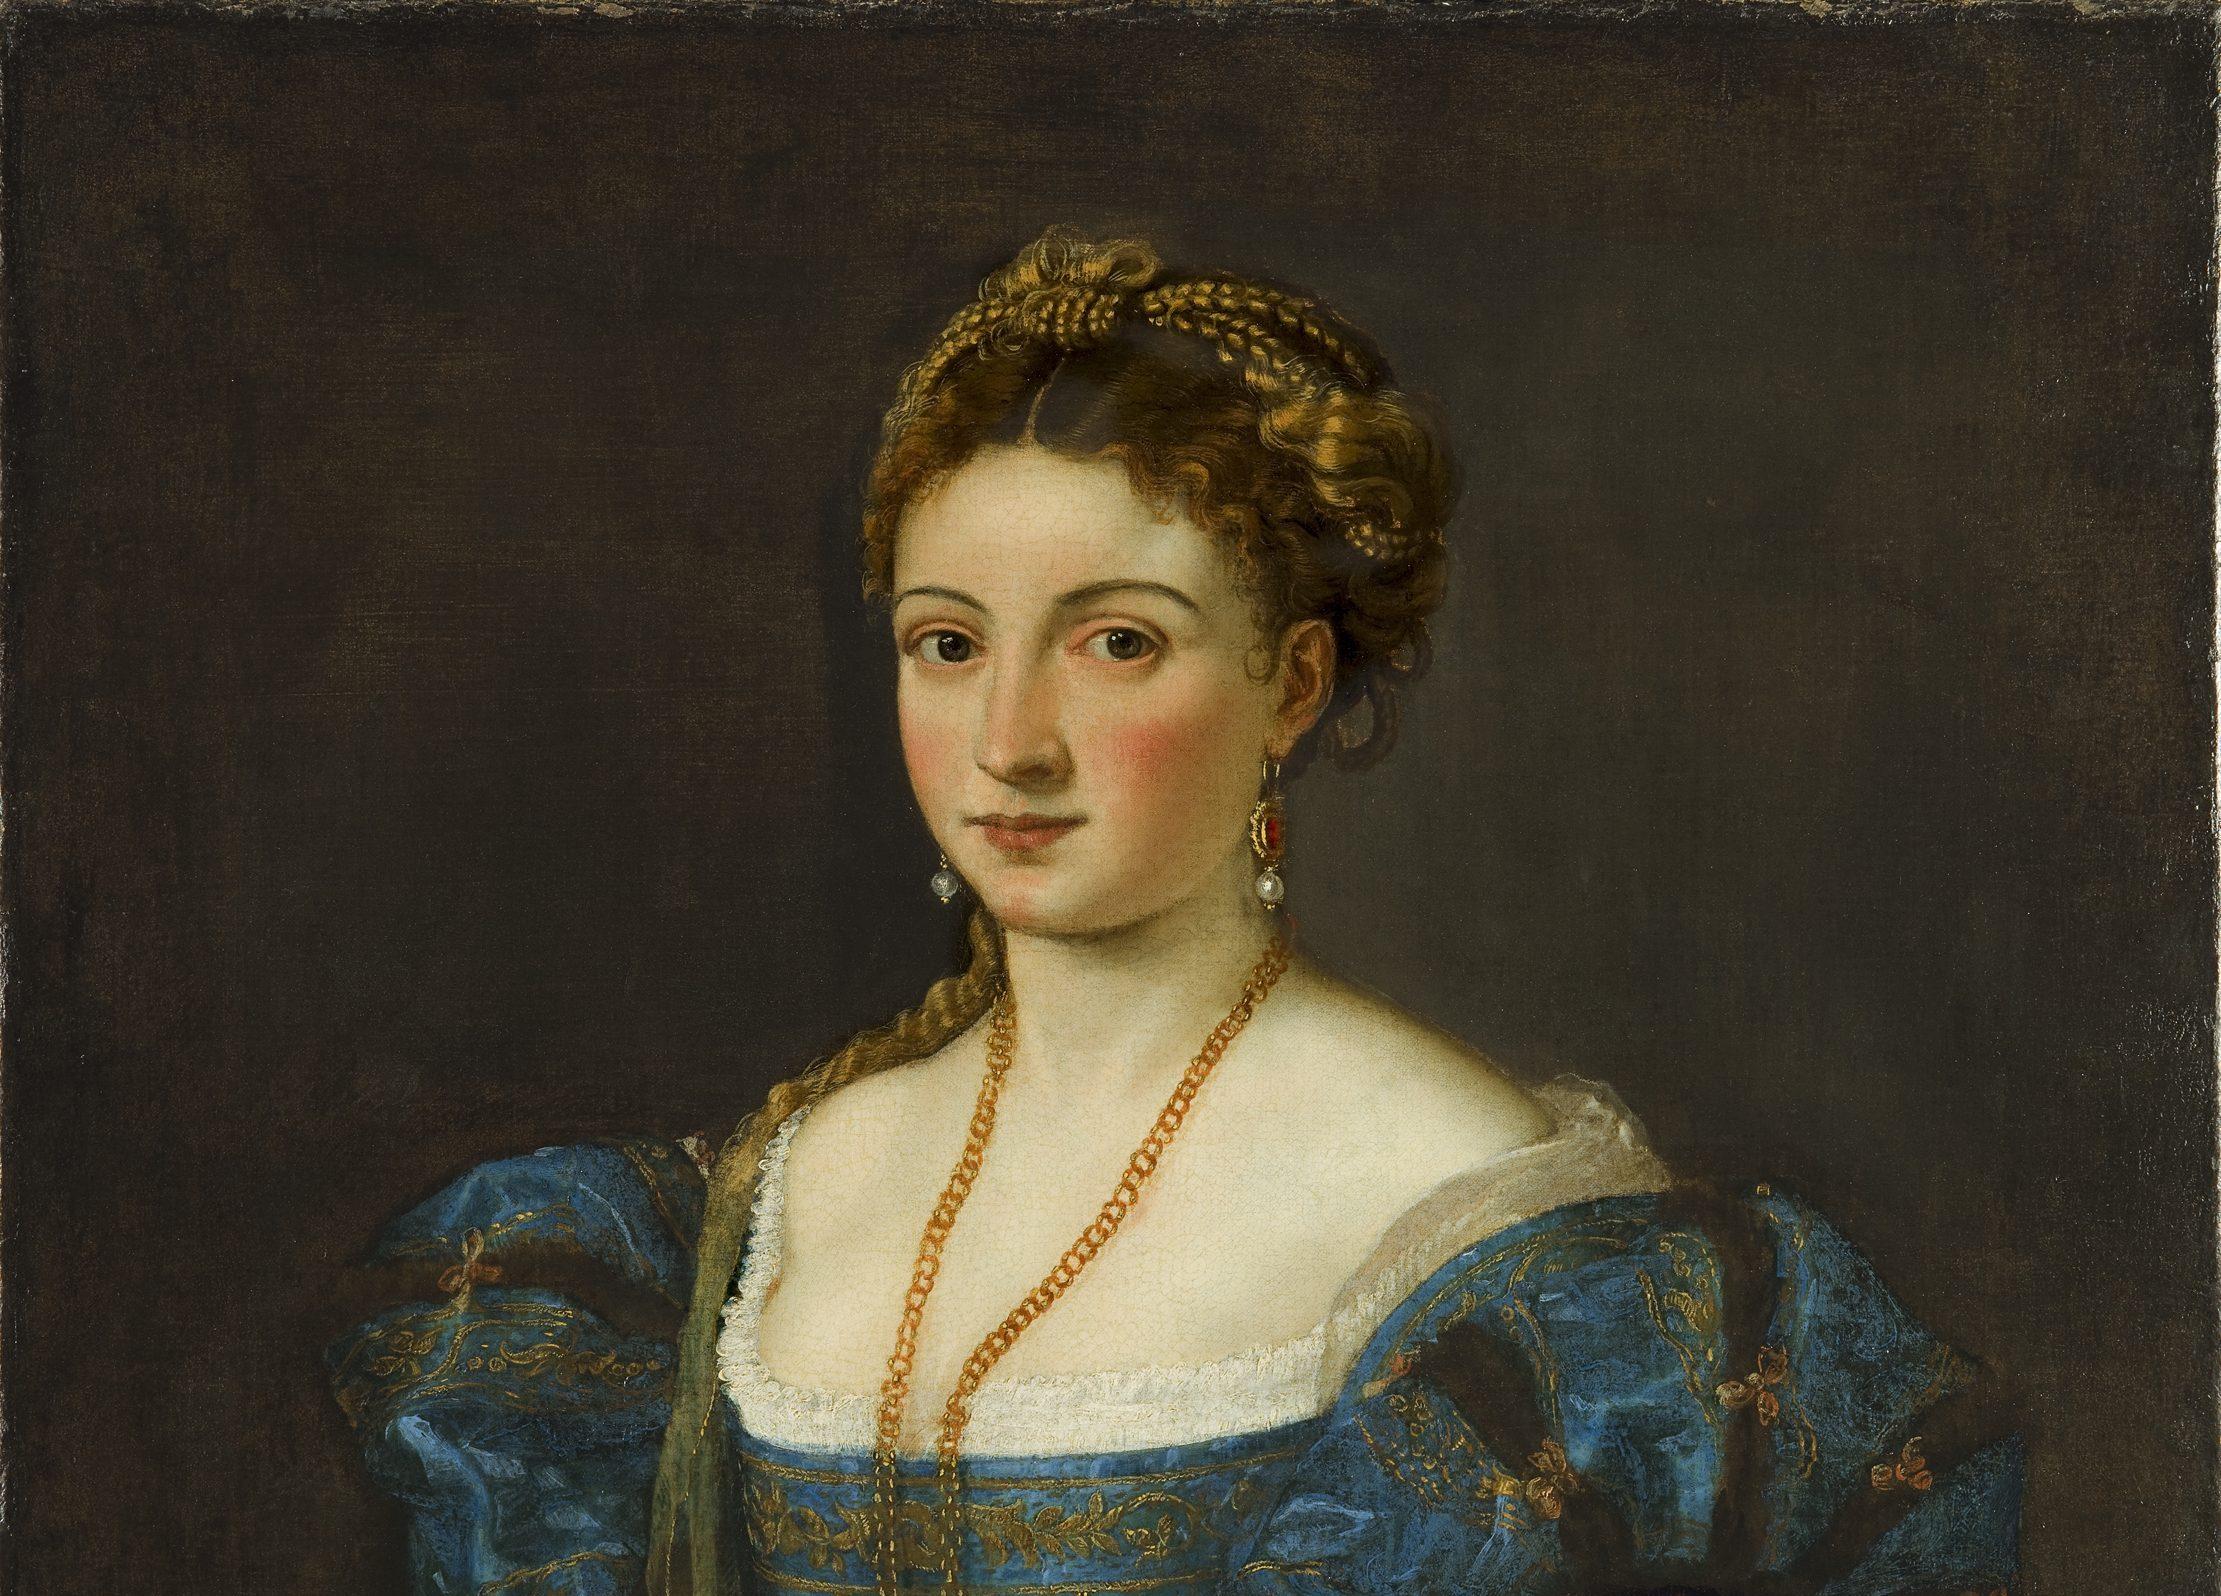 El Esplendor De La Pintura Renacentista Veneciana Arsmagazine